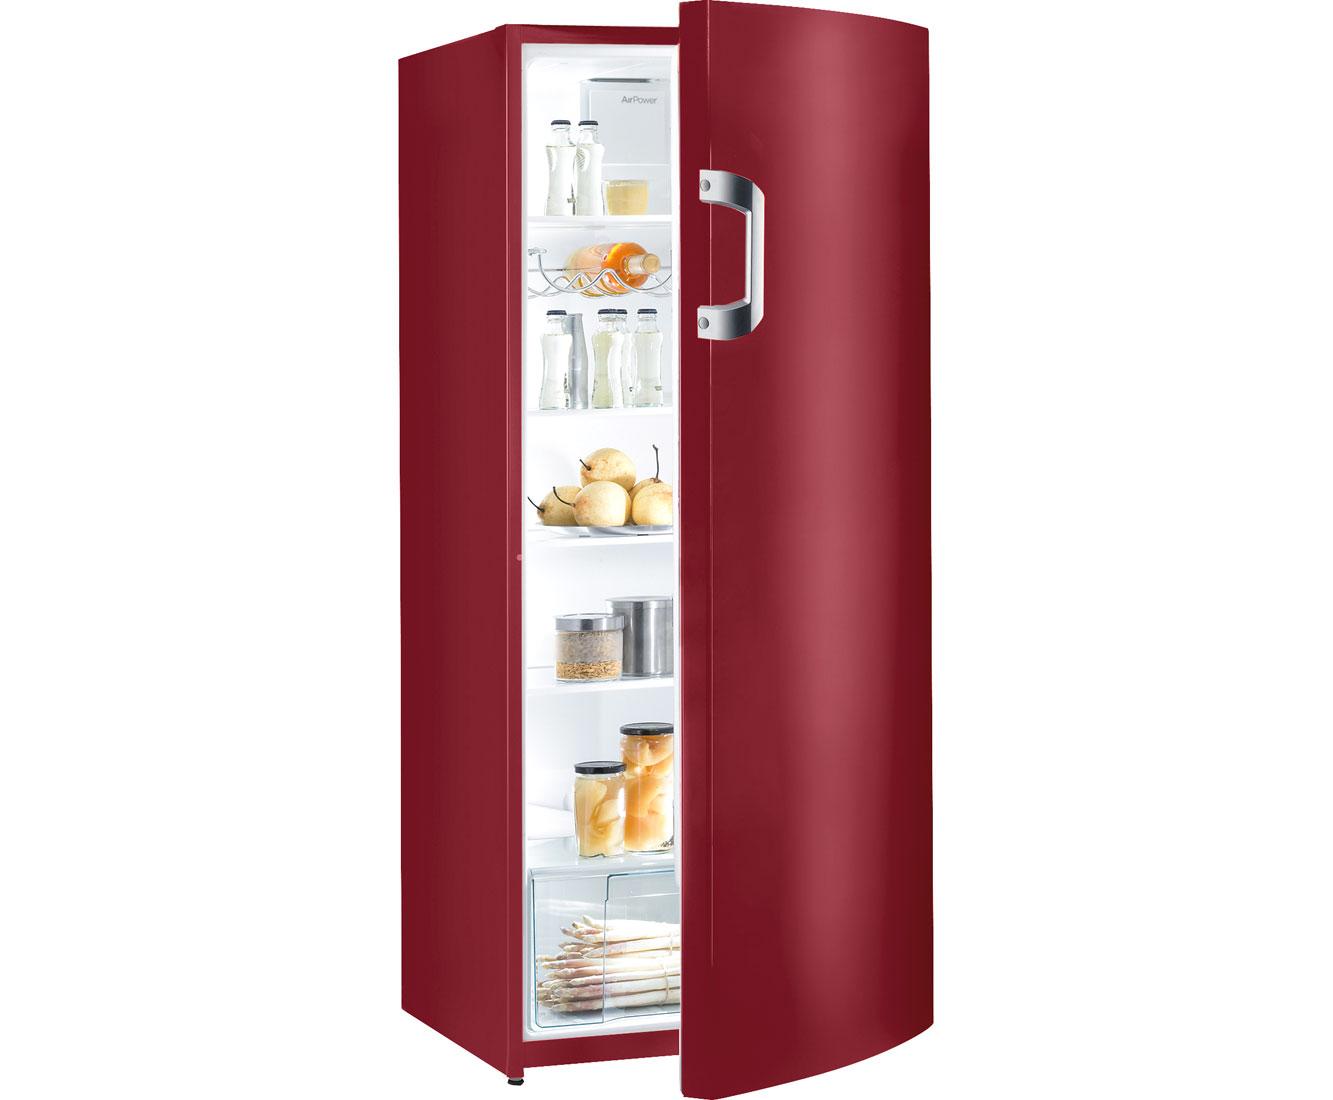 Gorenje Retro Kühlschrank Vw : Retro kühlschrank vw kühlschrank gorenje retro vw gorenje u retro